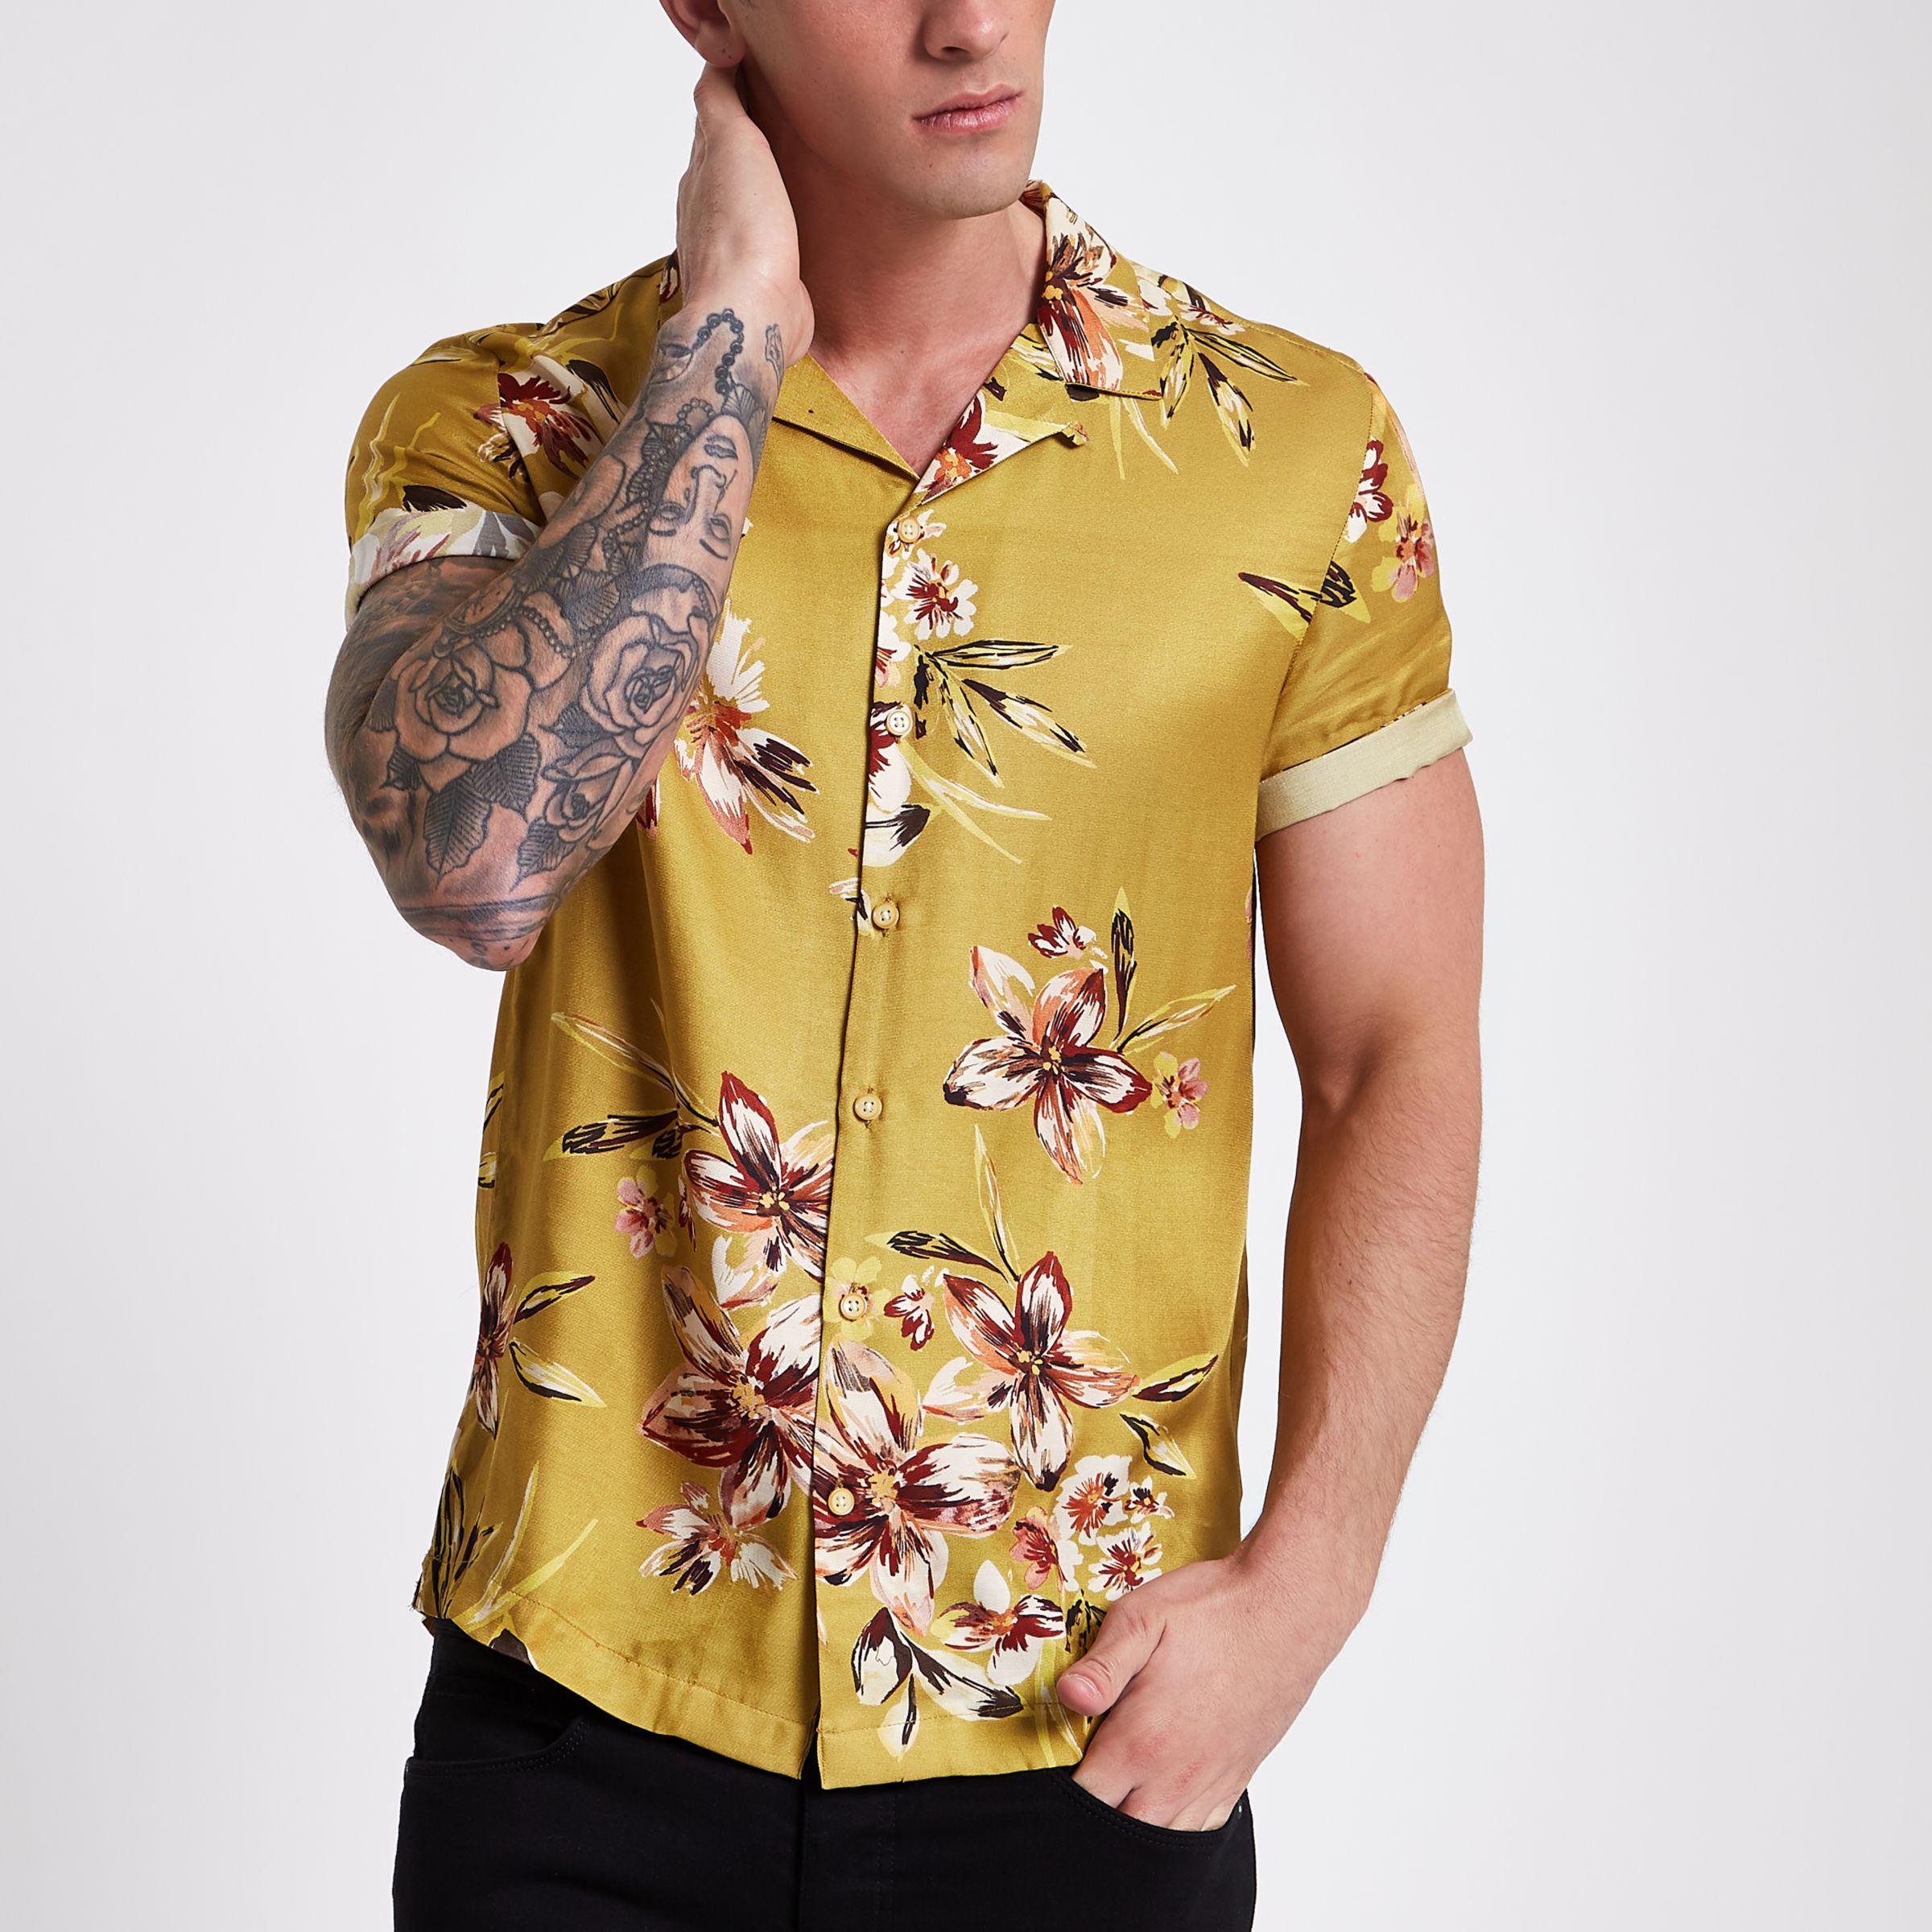 af289ee6ea515 Lyst - River Island Mustard Floral Short Sleeve Shirt in Yellow for Men